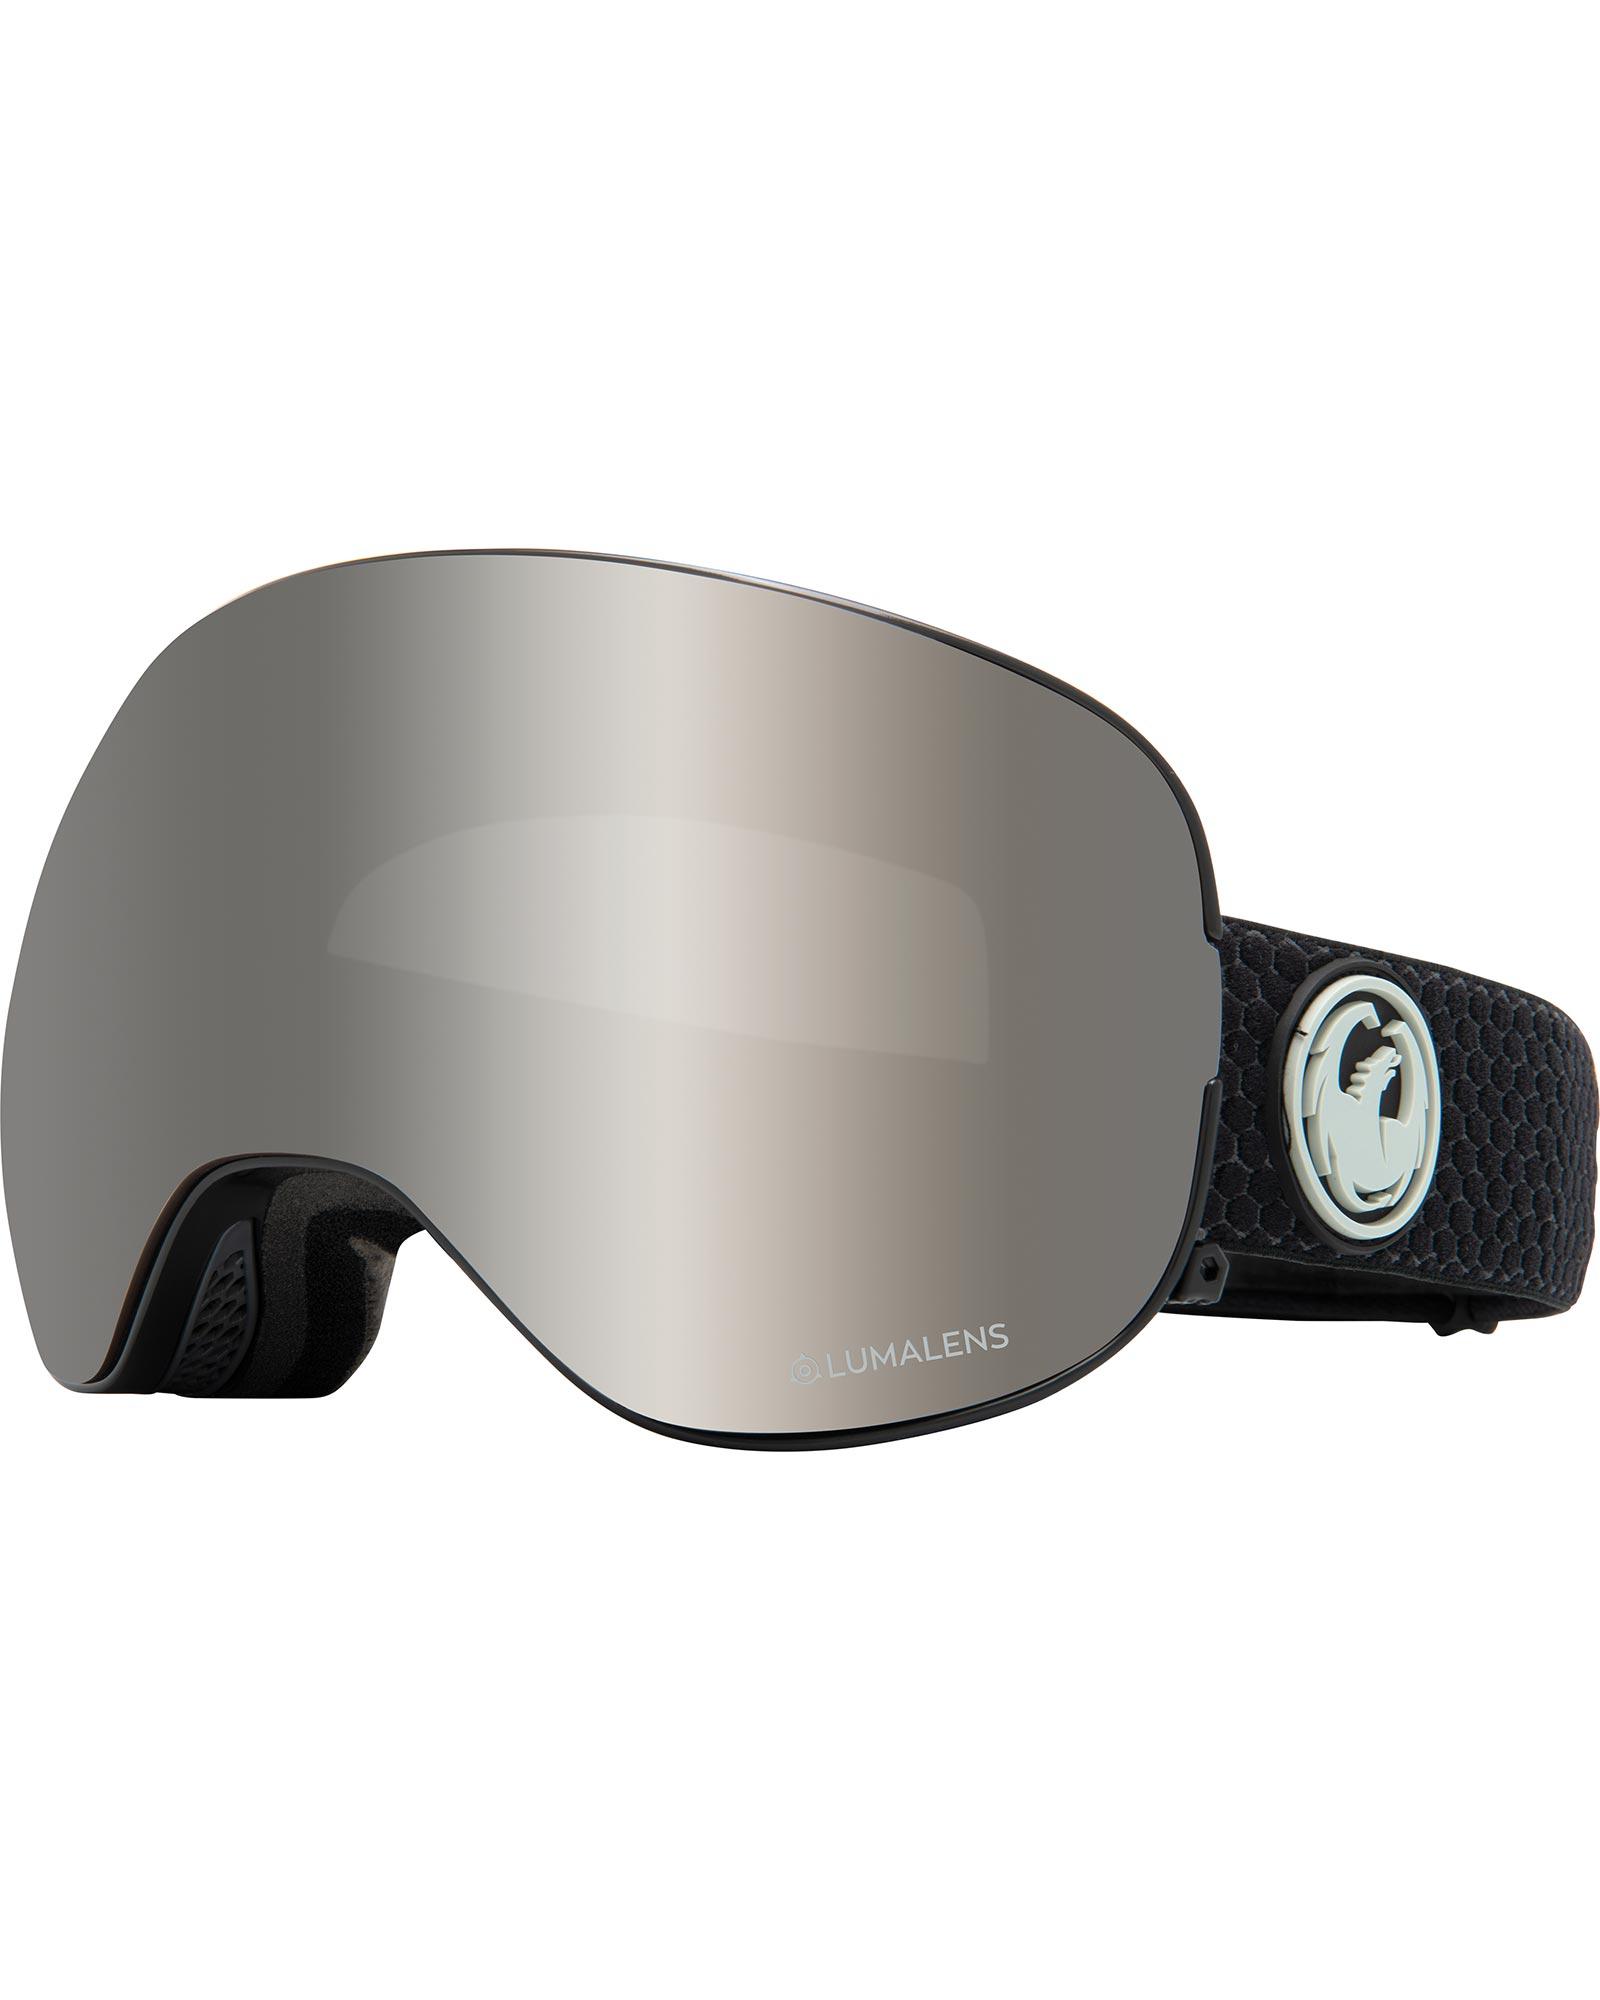 Dragon X2 Split / Lumalens Silver Ionized + Lumalens Flash Blue Goggles 0